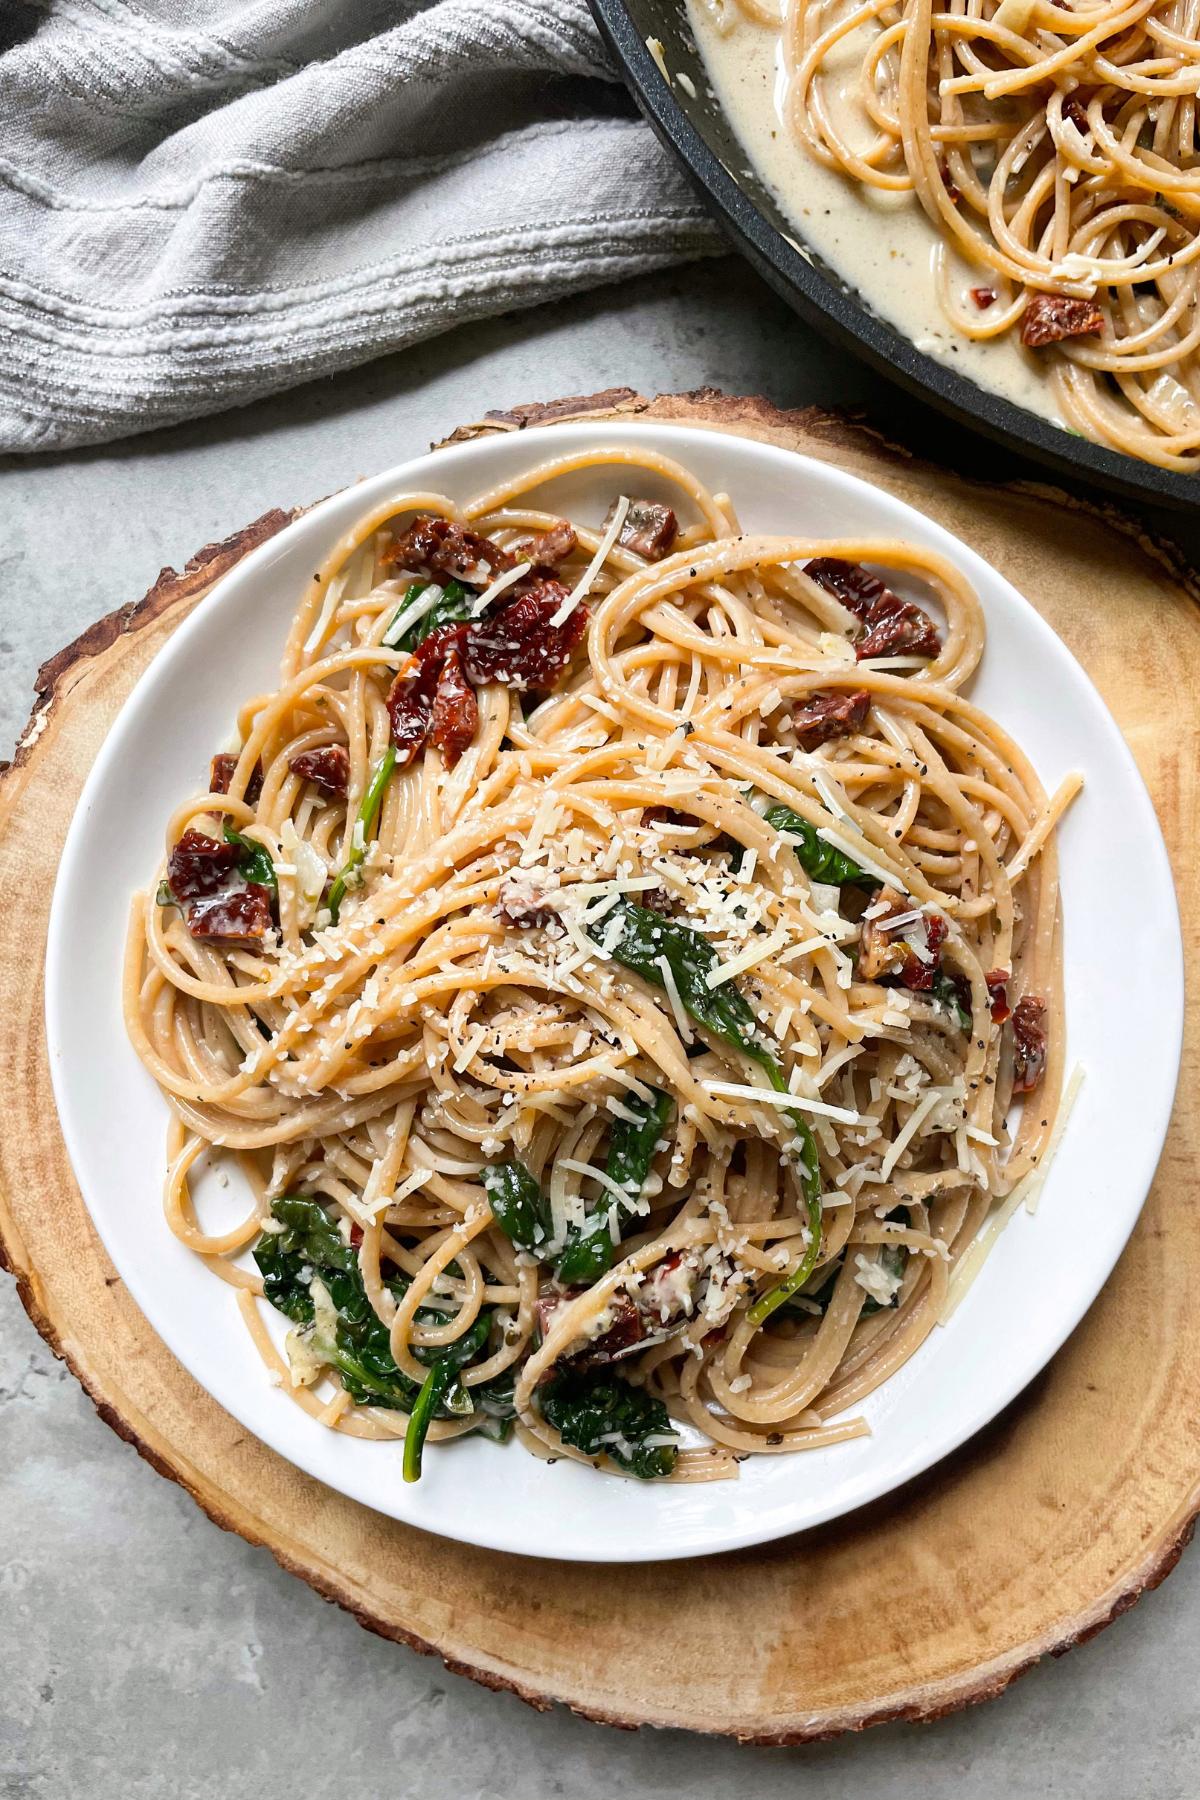 plate with whole wheat spaghetti